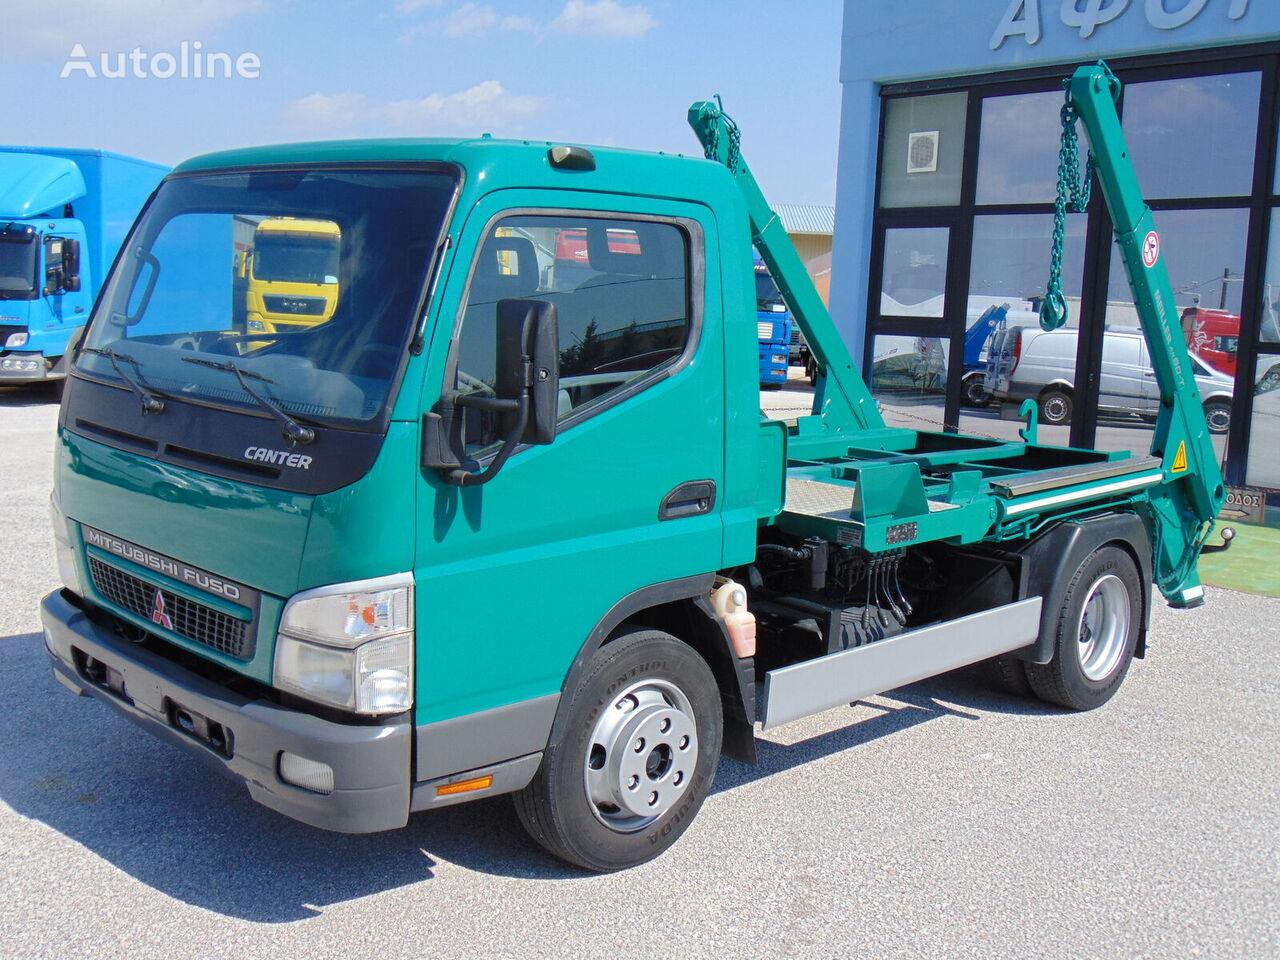 MITSUBISHI FUSO CANTER FE85 kravas automašīna konteinera vedējs